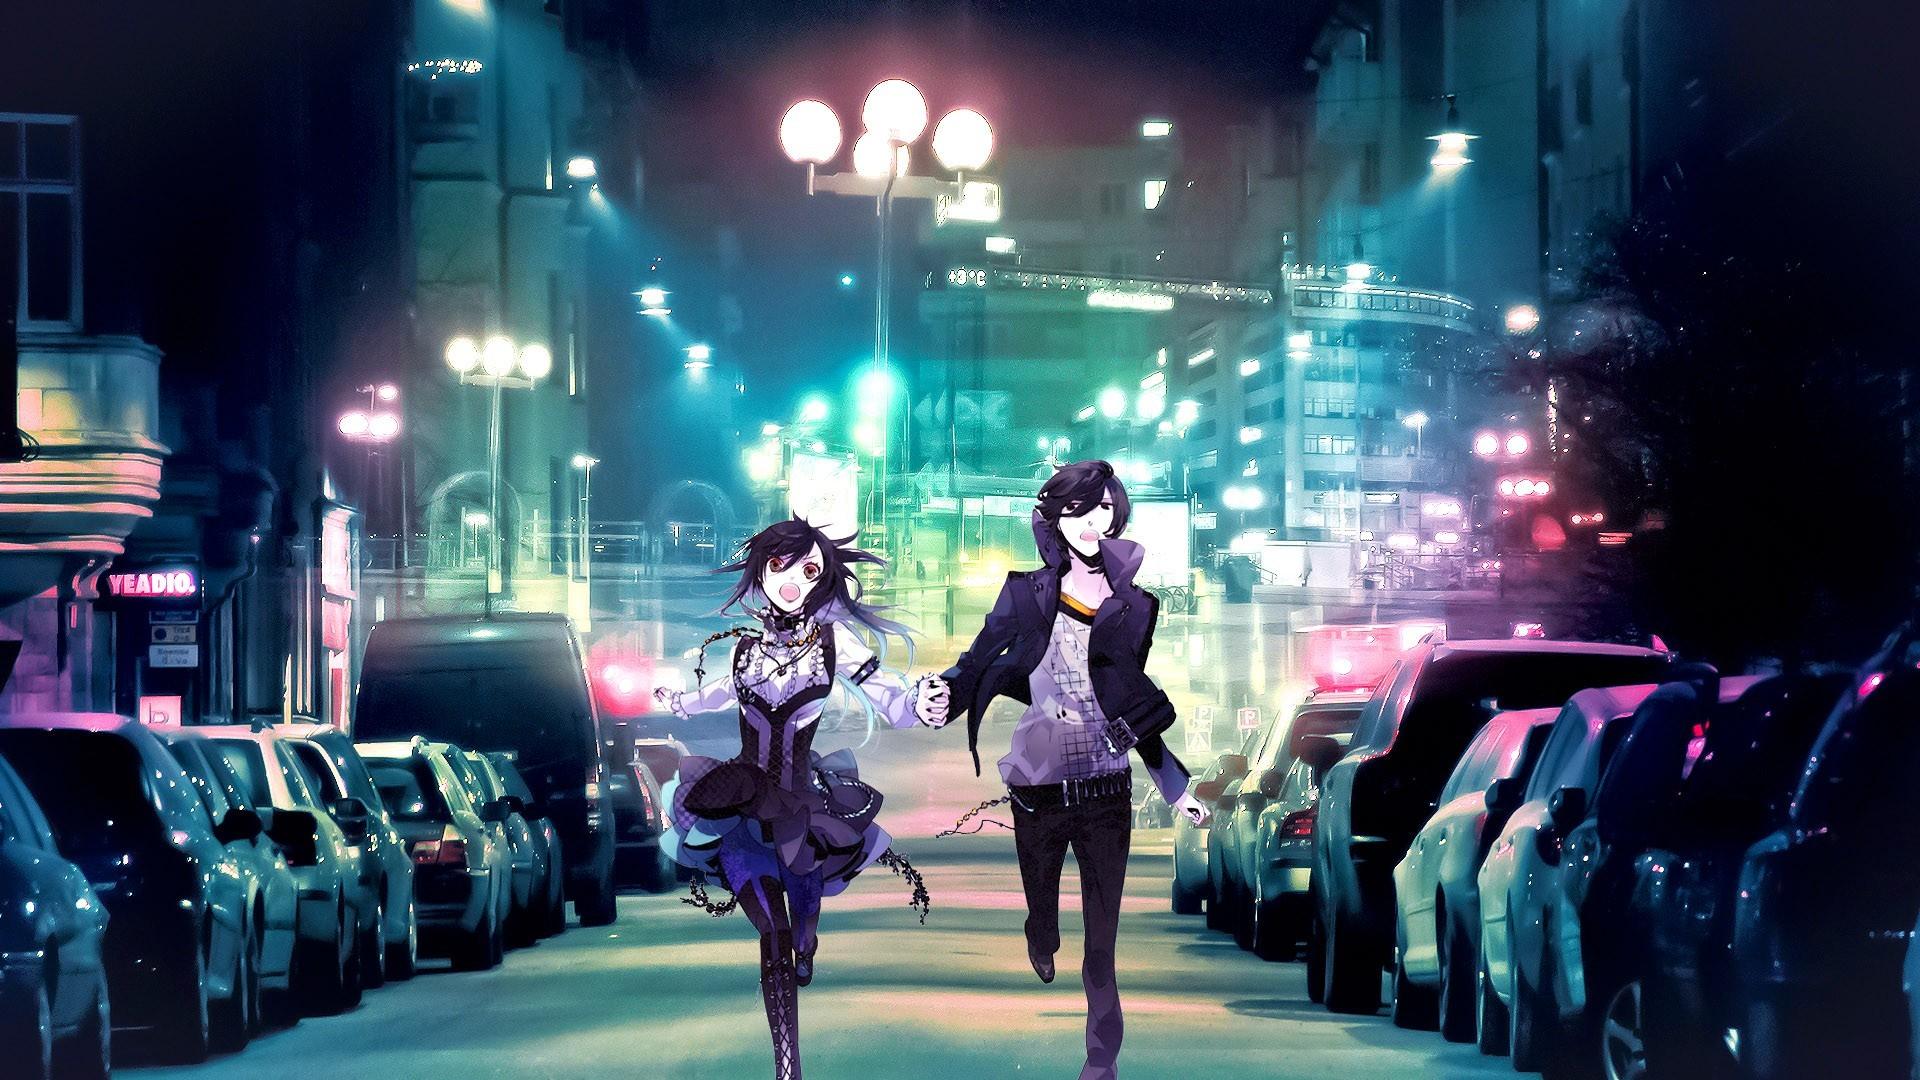 76 Romantic Anime Wallpapers On Wallpapersafari